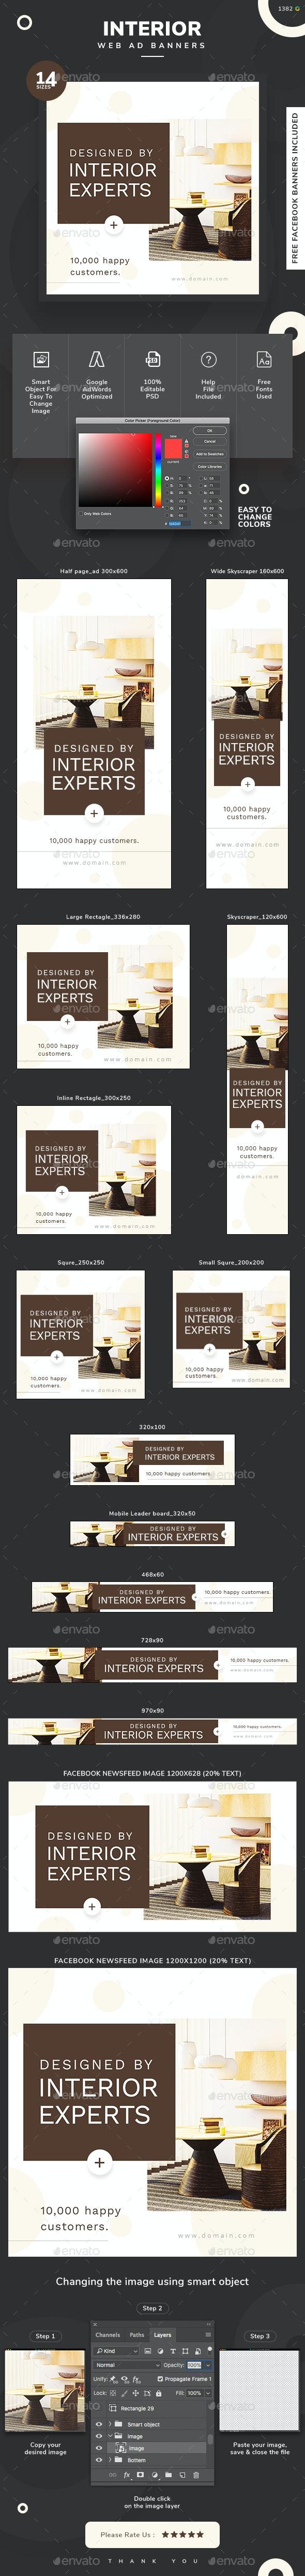 Interior Design Web Banner Set - Banners & Ads Web Elements